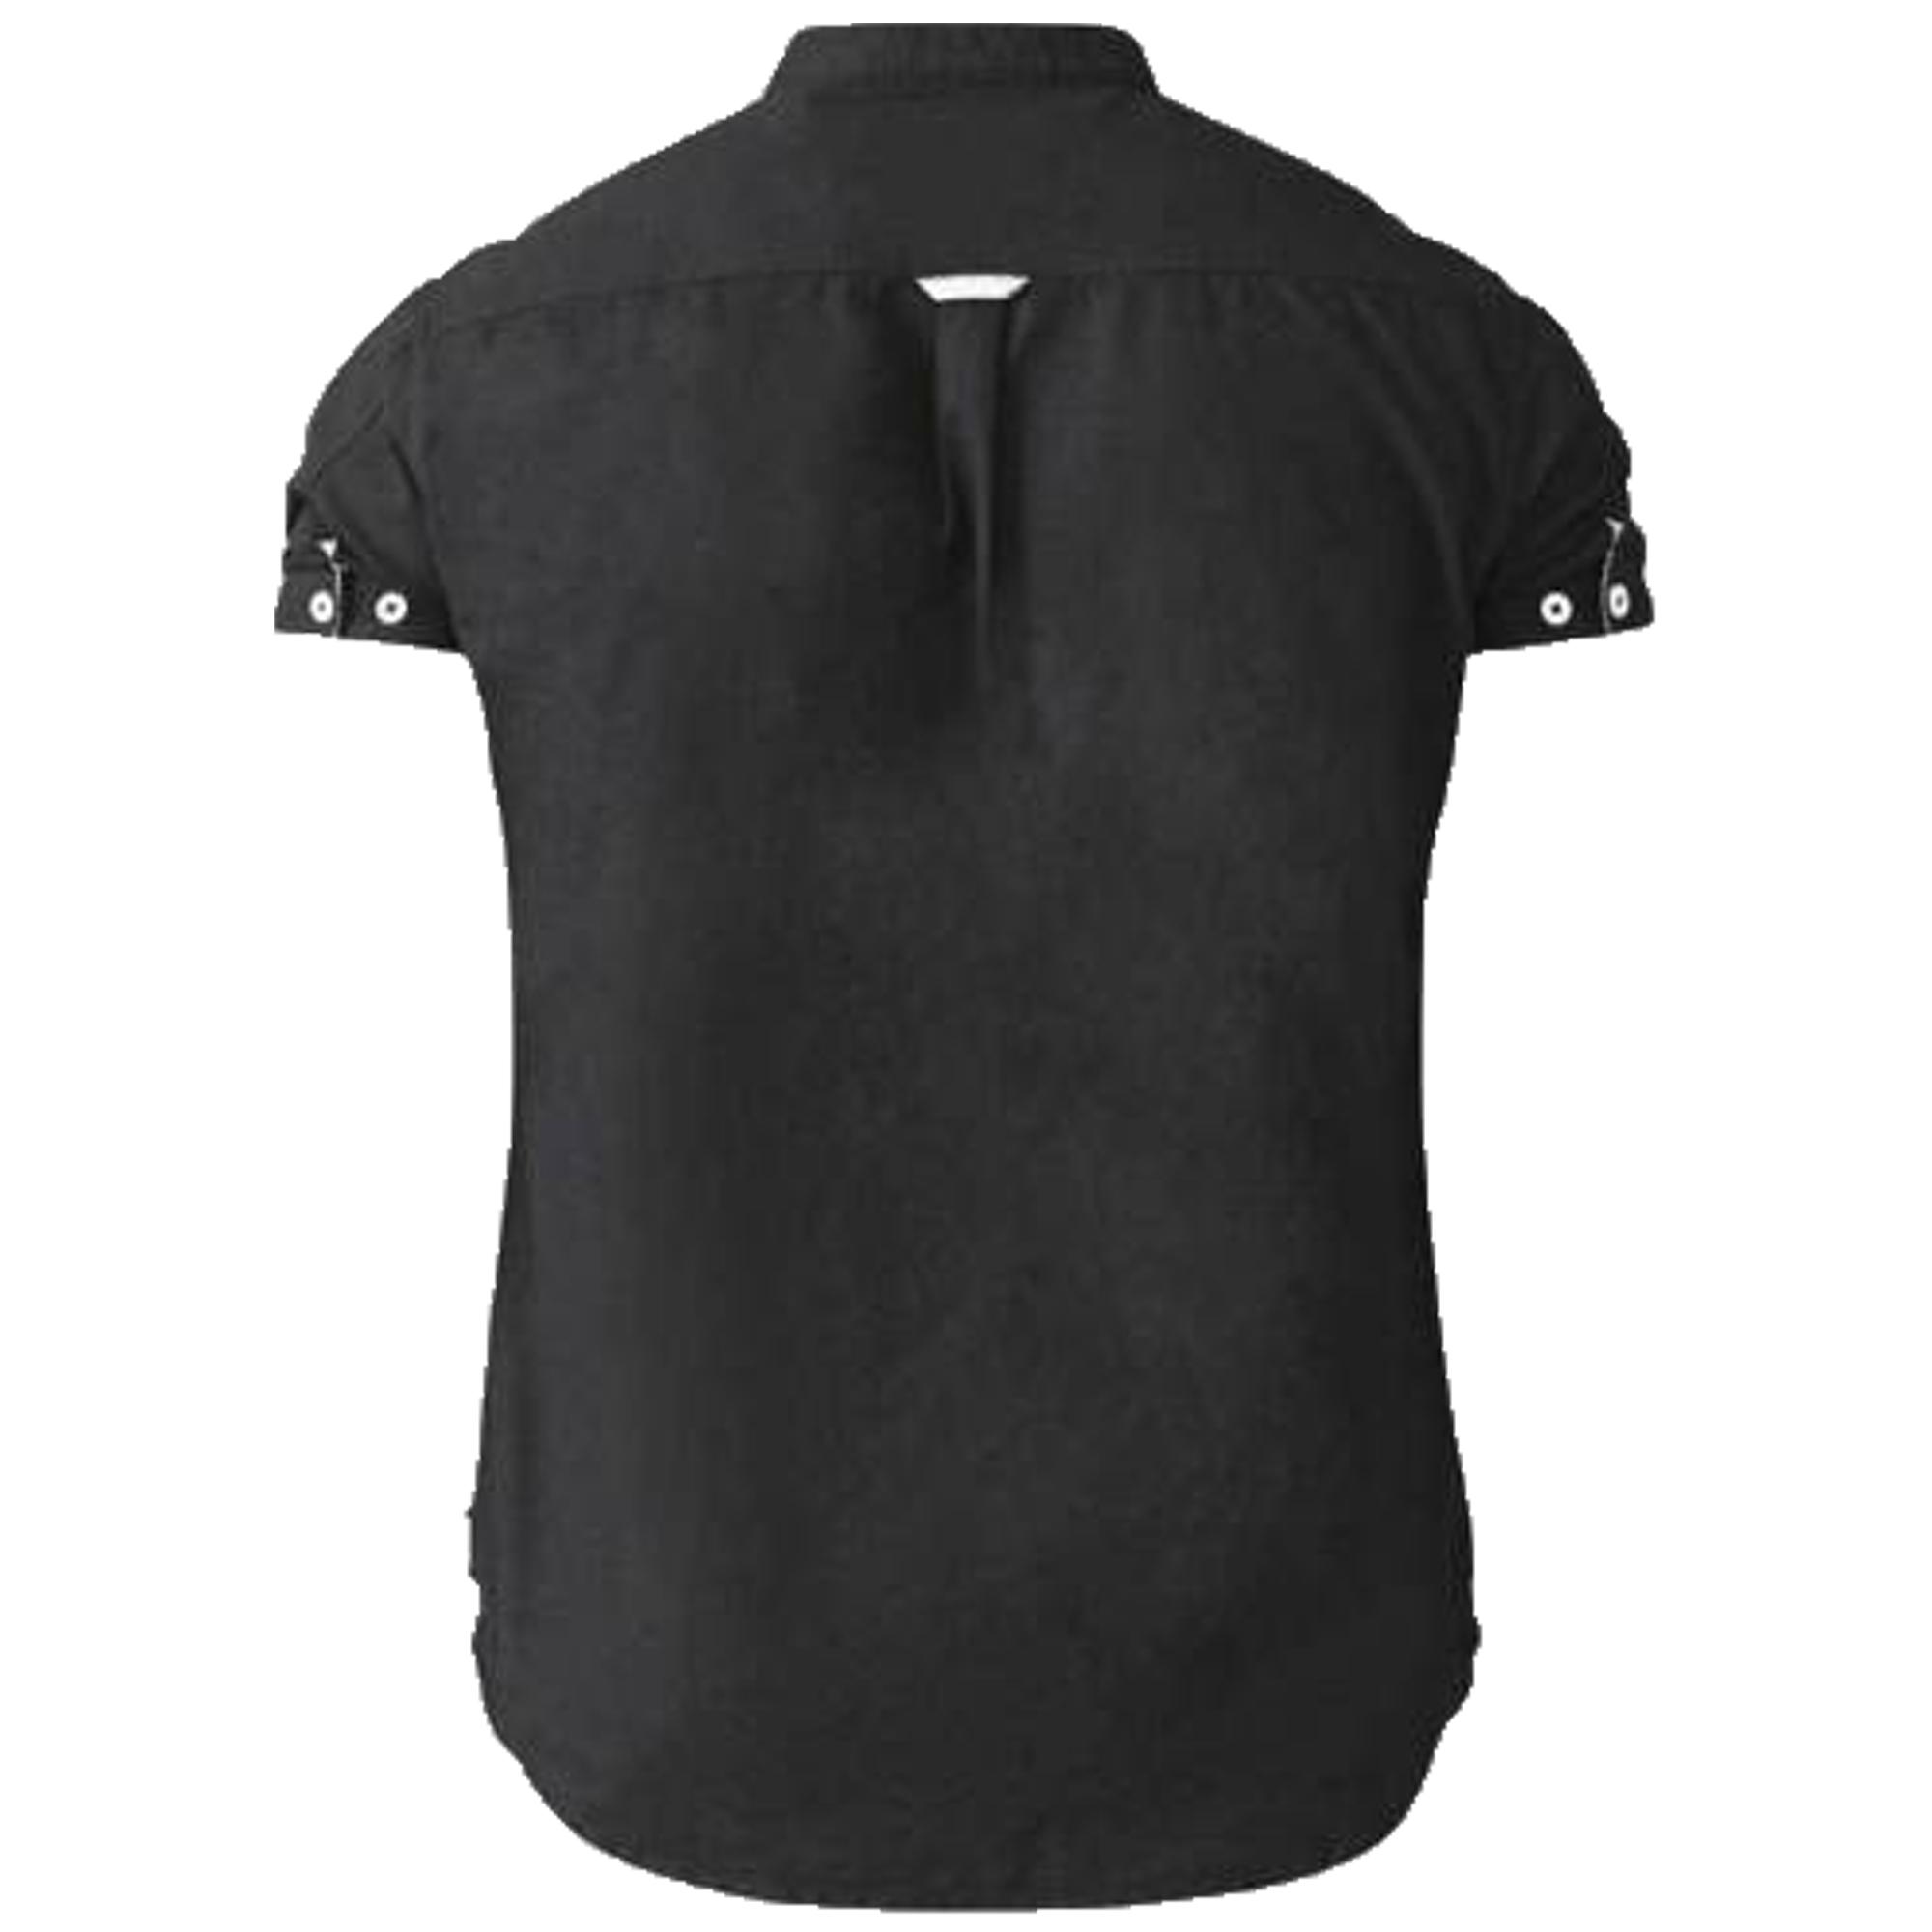 Camisa-Para-Hombres-D555-Duke-Algodon-Oxford-Big-King-Size-Dwight-Norman-de-Manga-Corta-Nuevo miniatura 3